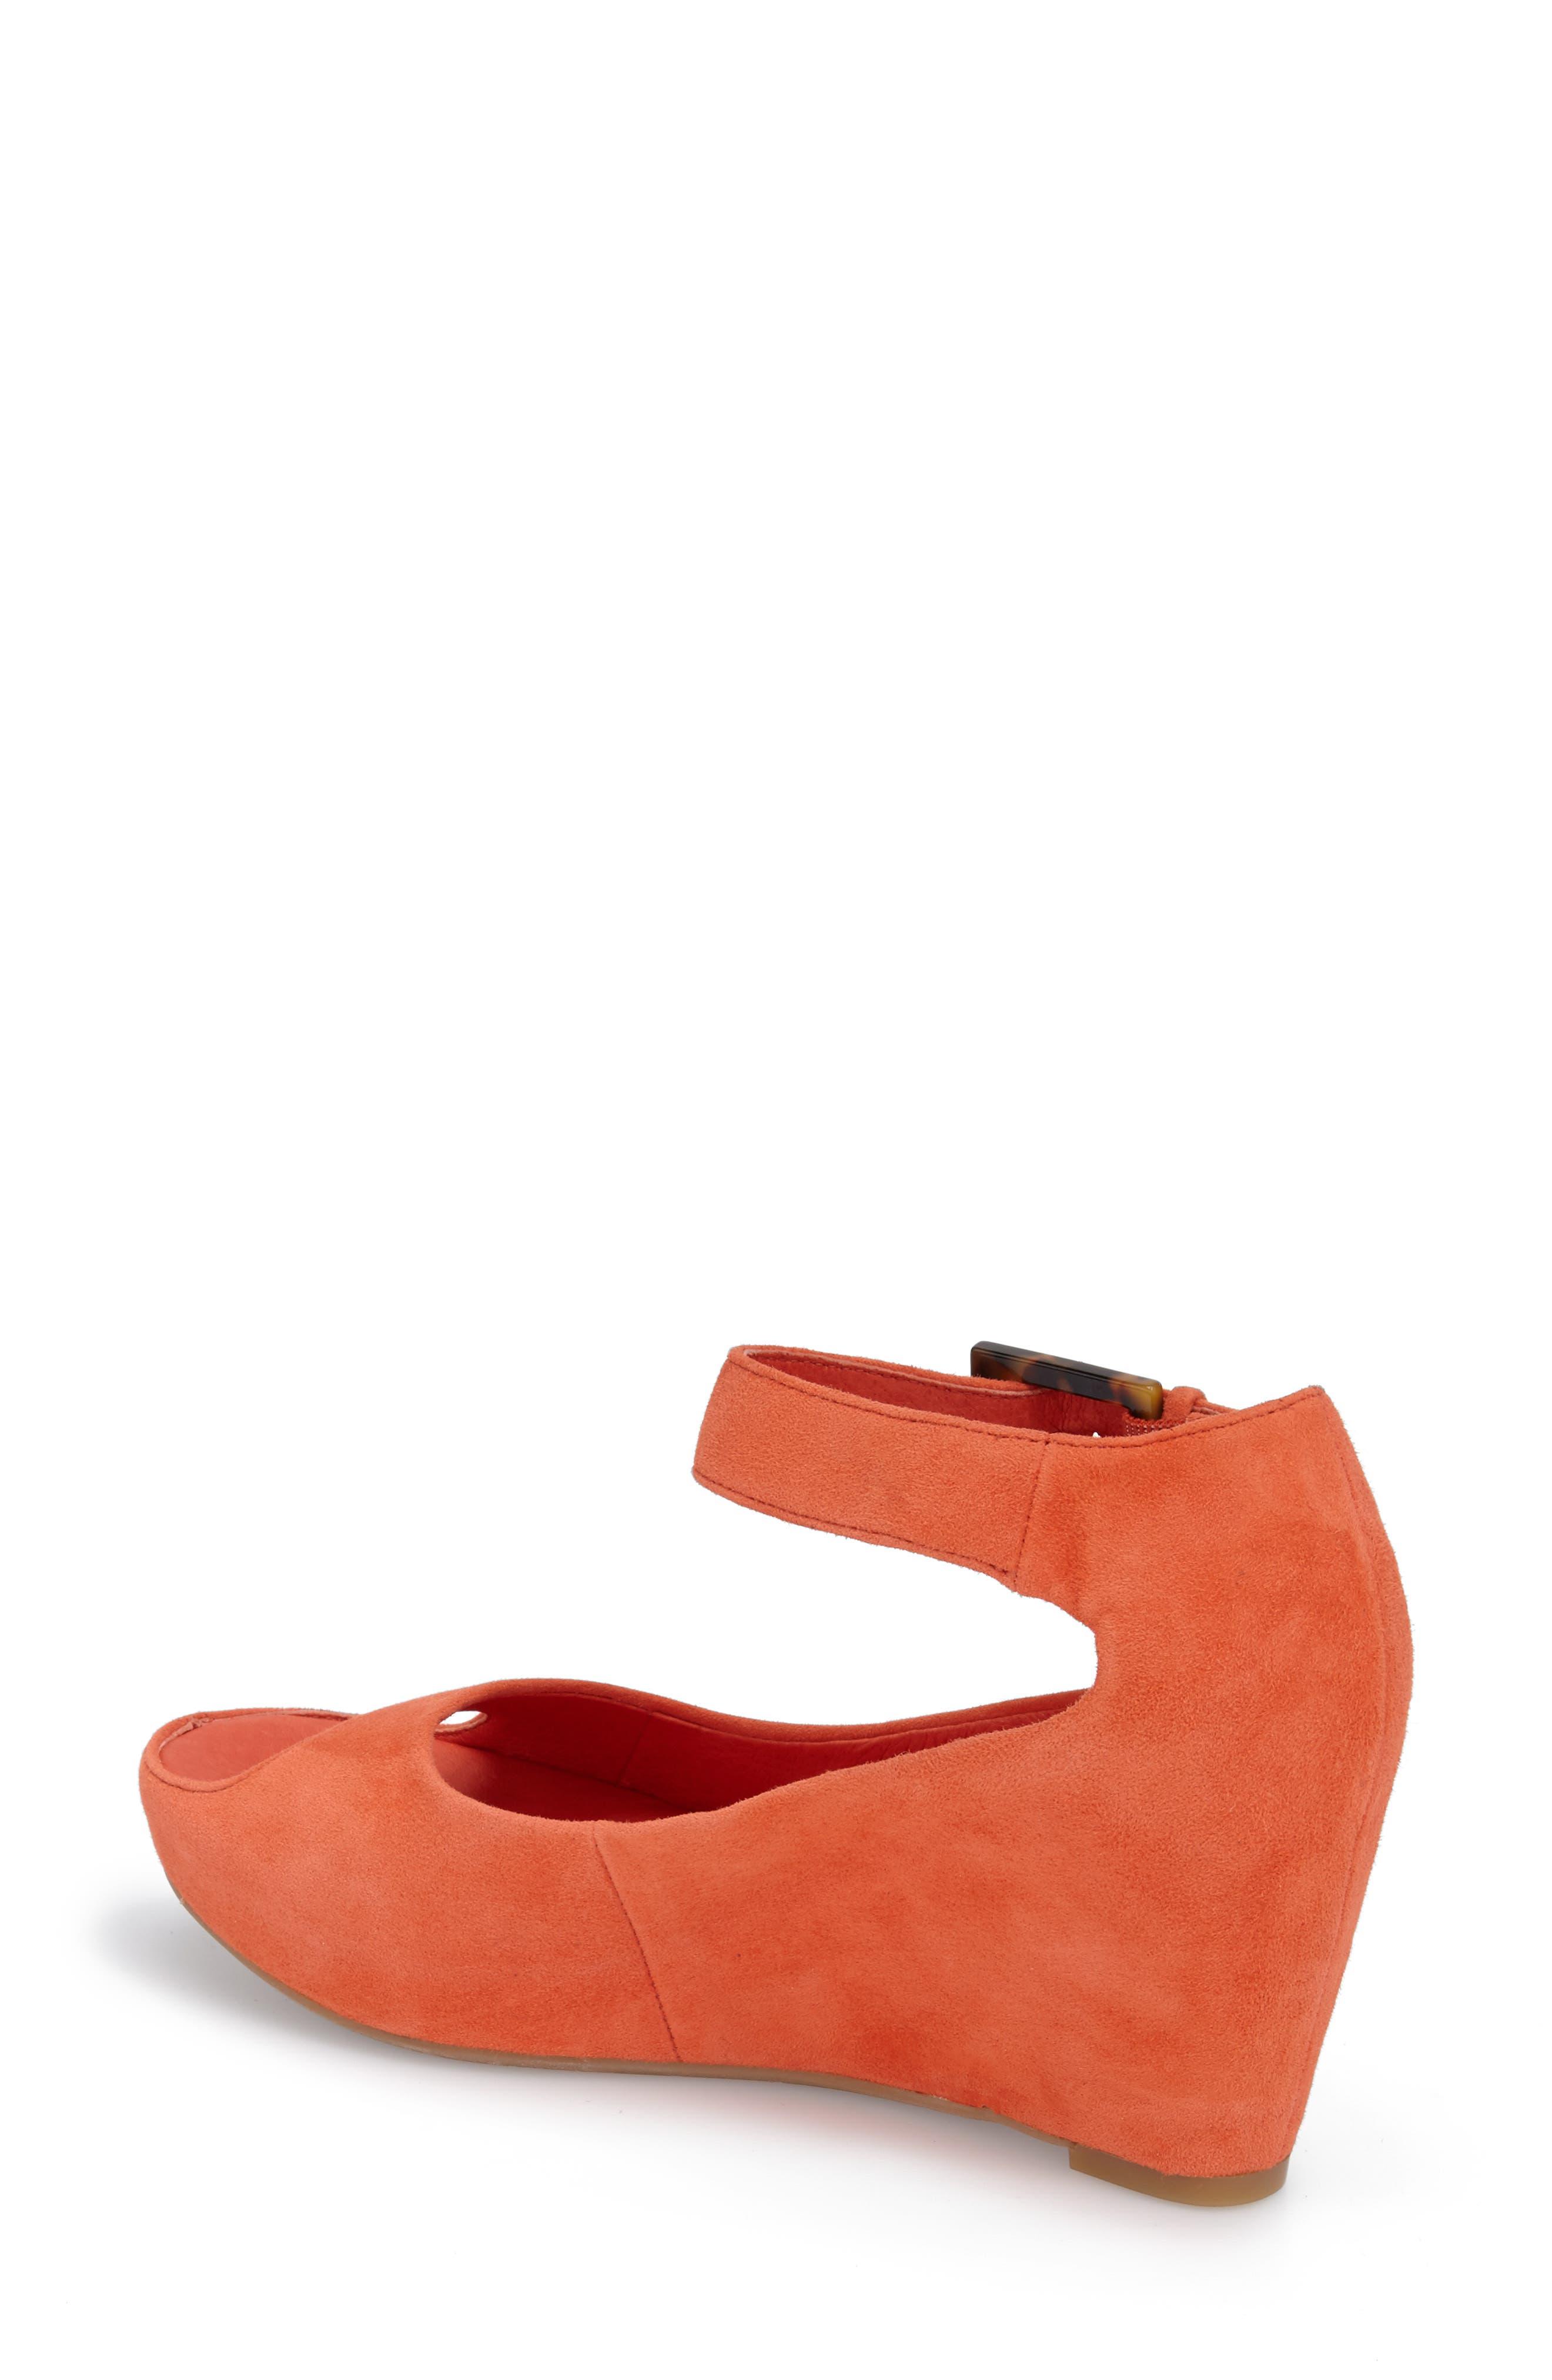 'Tricia' Ankle Strap Sandal,                             Alternate thumbnail 44, color,